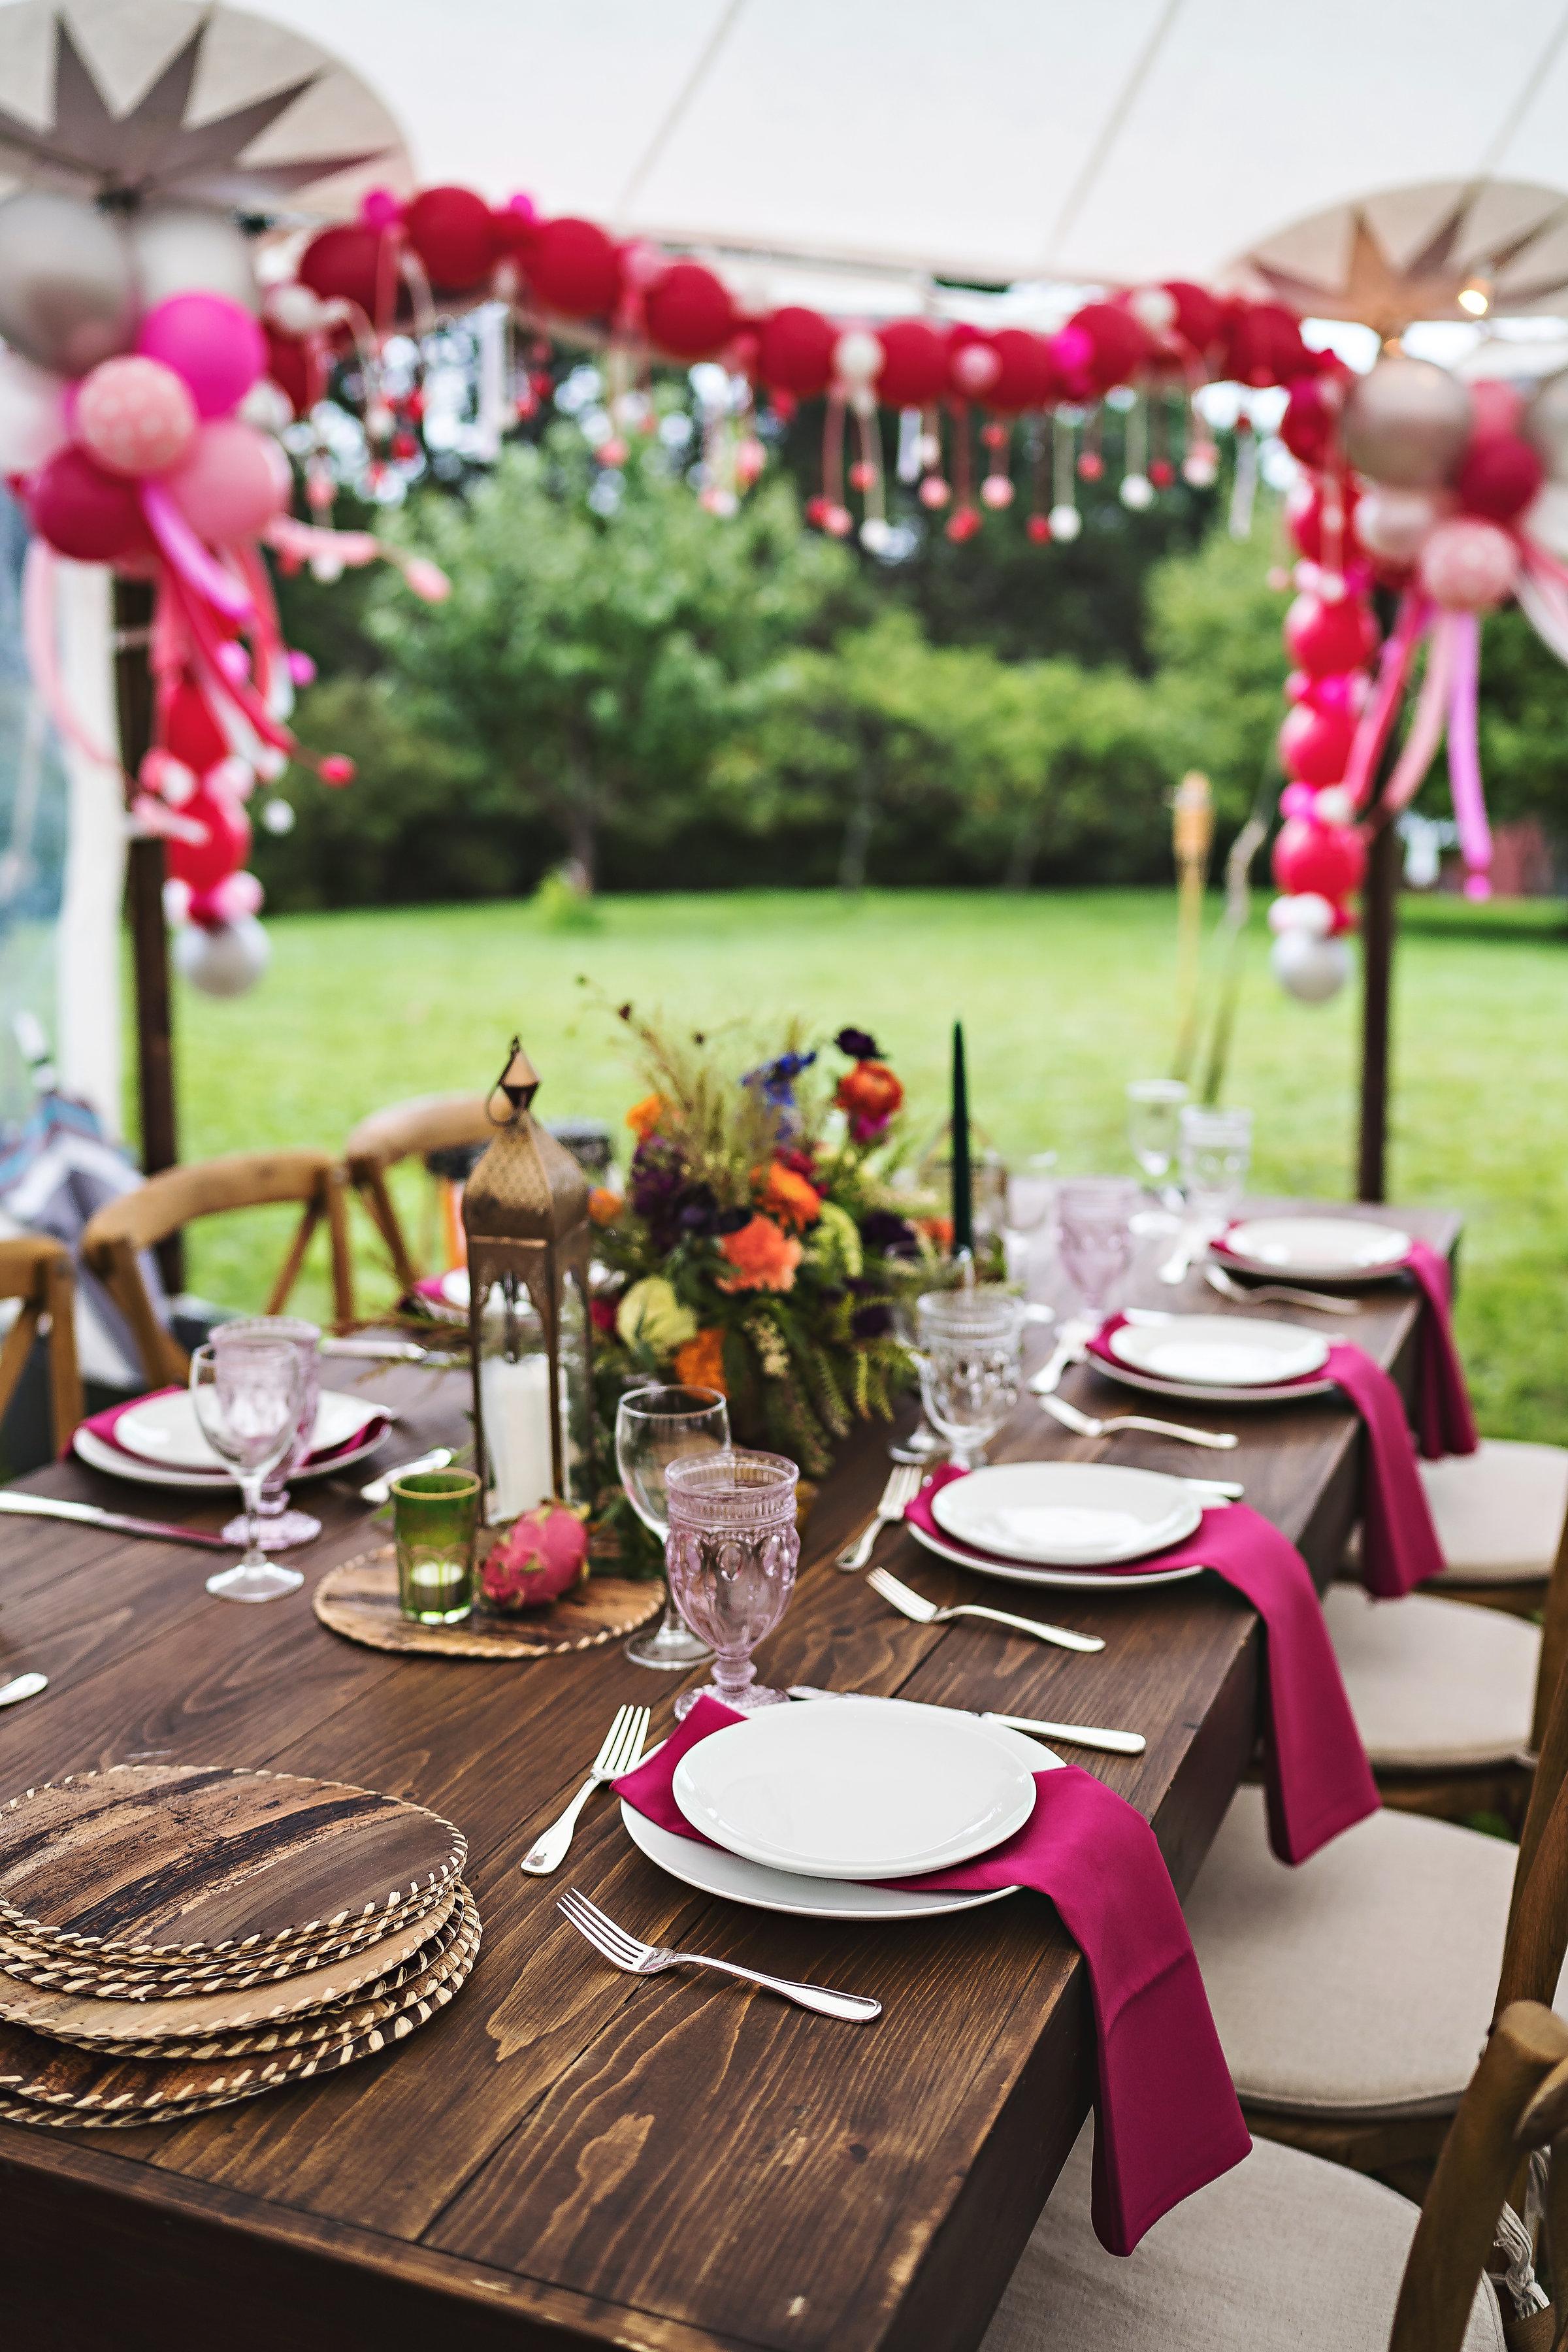 upstate-ny-wedding-jove-meyer-events-inbal-sivan-046.jpg